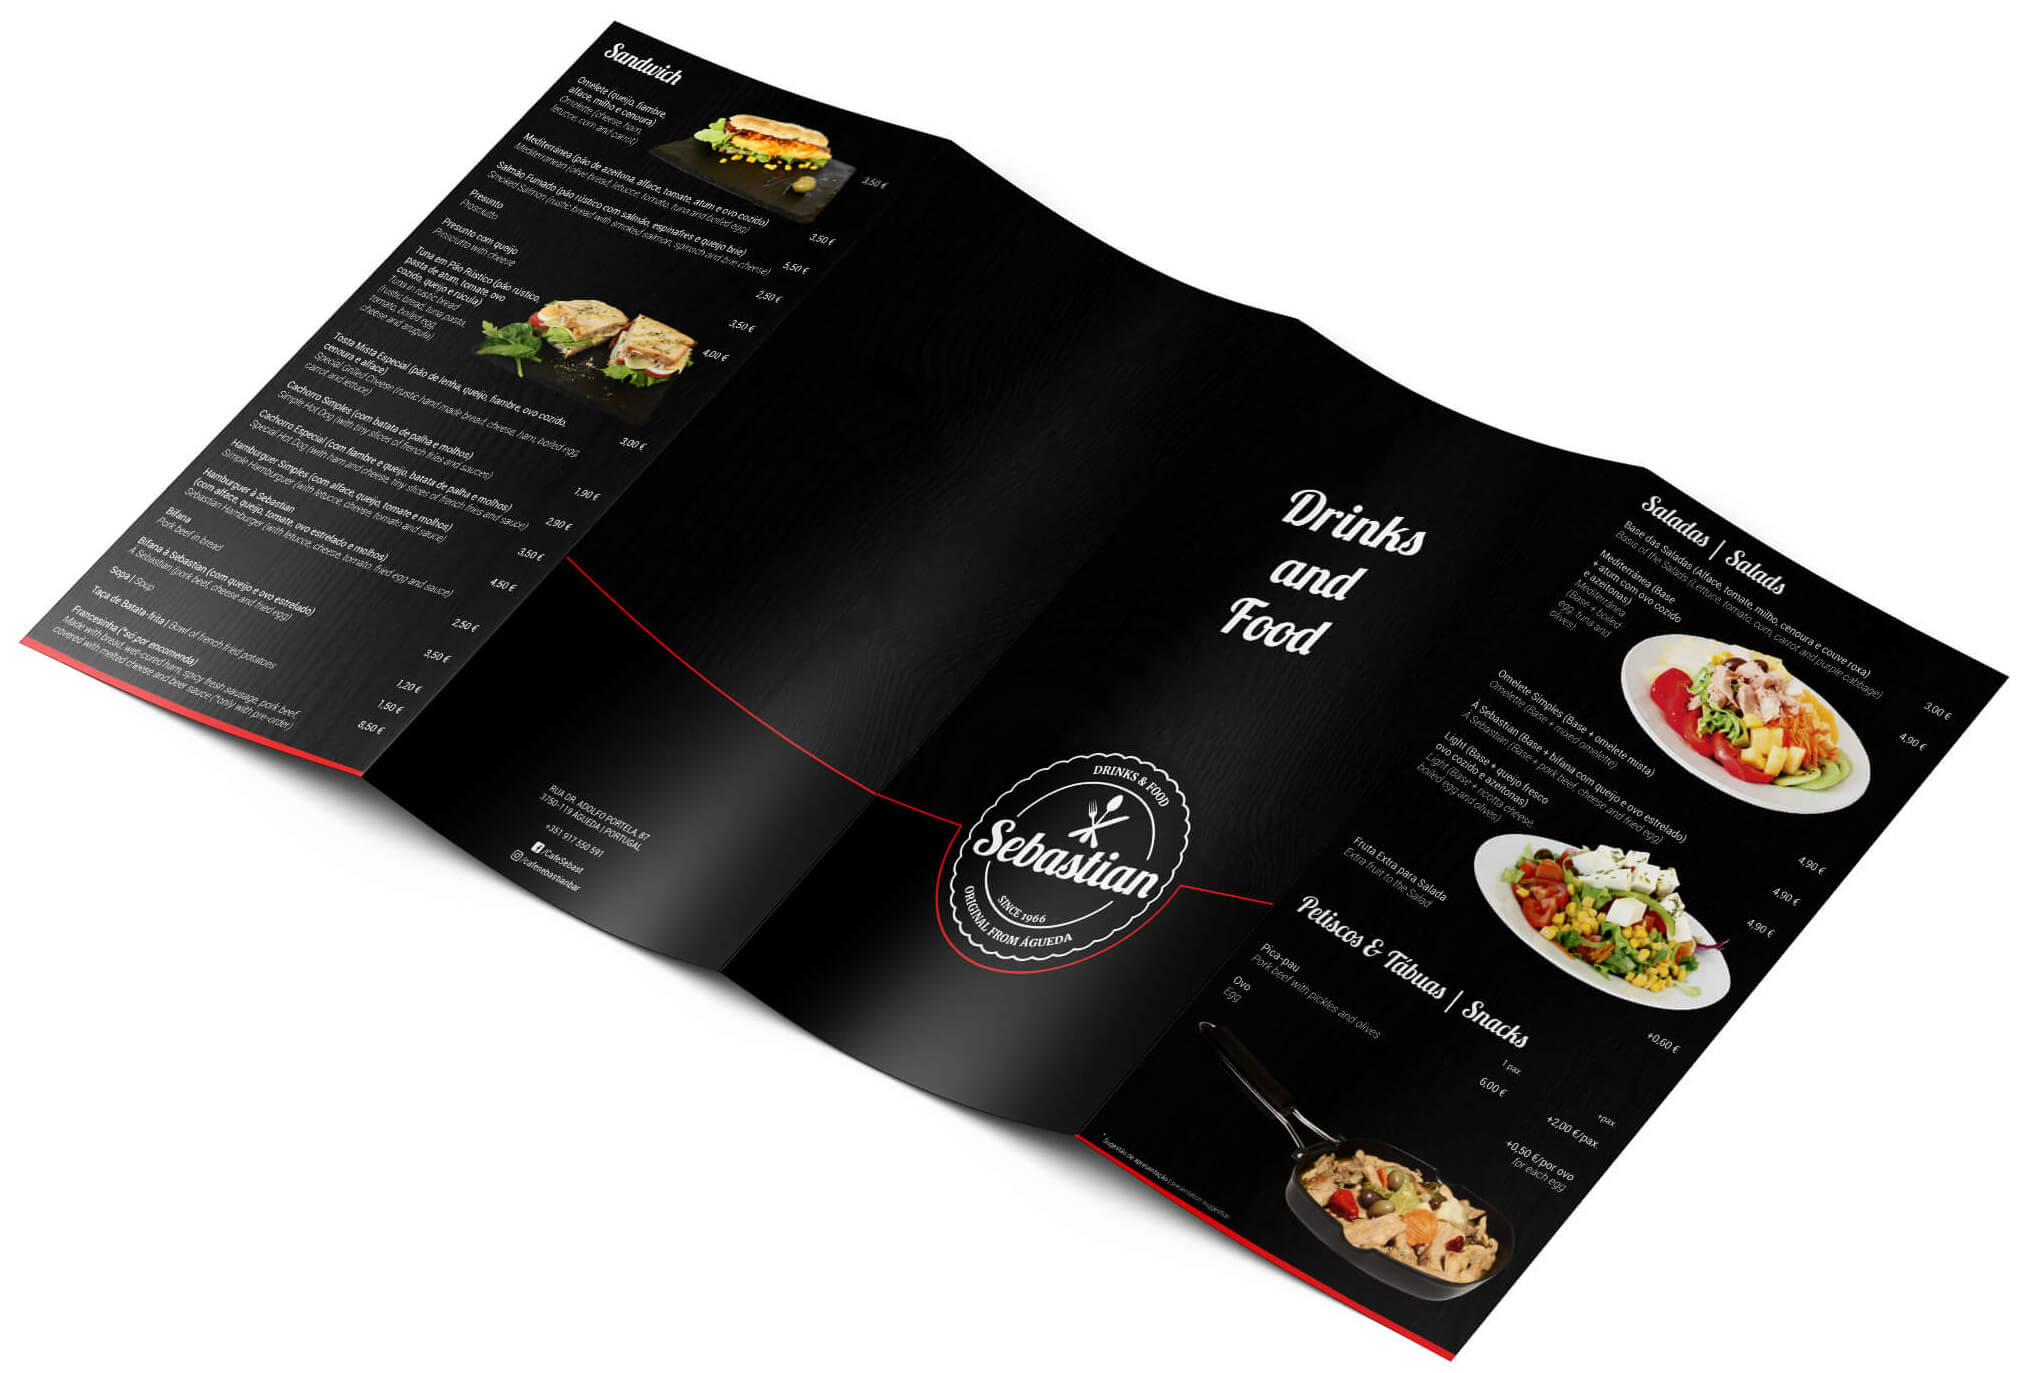 Café Sebastian Bar - Menu Mockup - Exterior | Way2Start - Design & Digital Agency